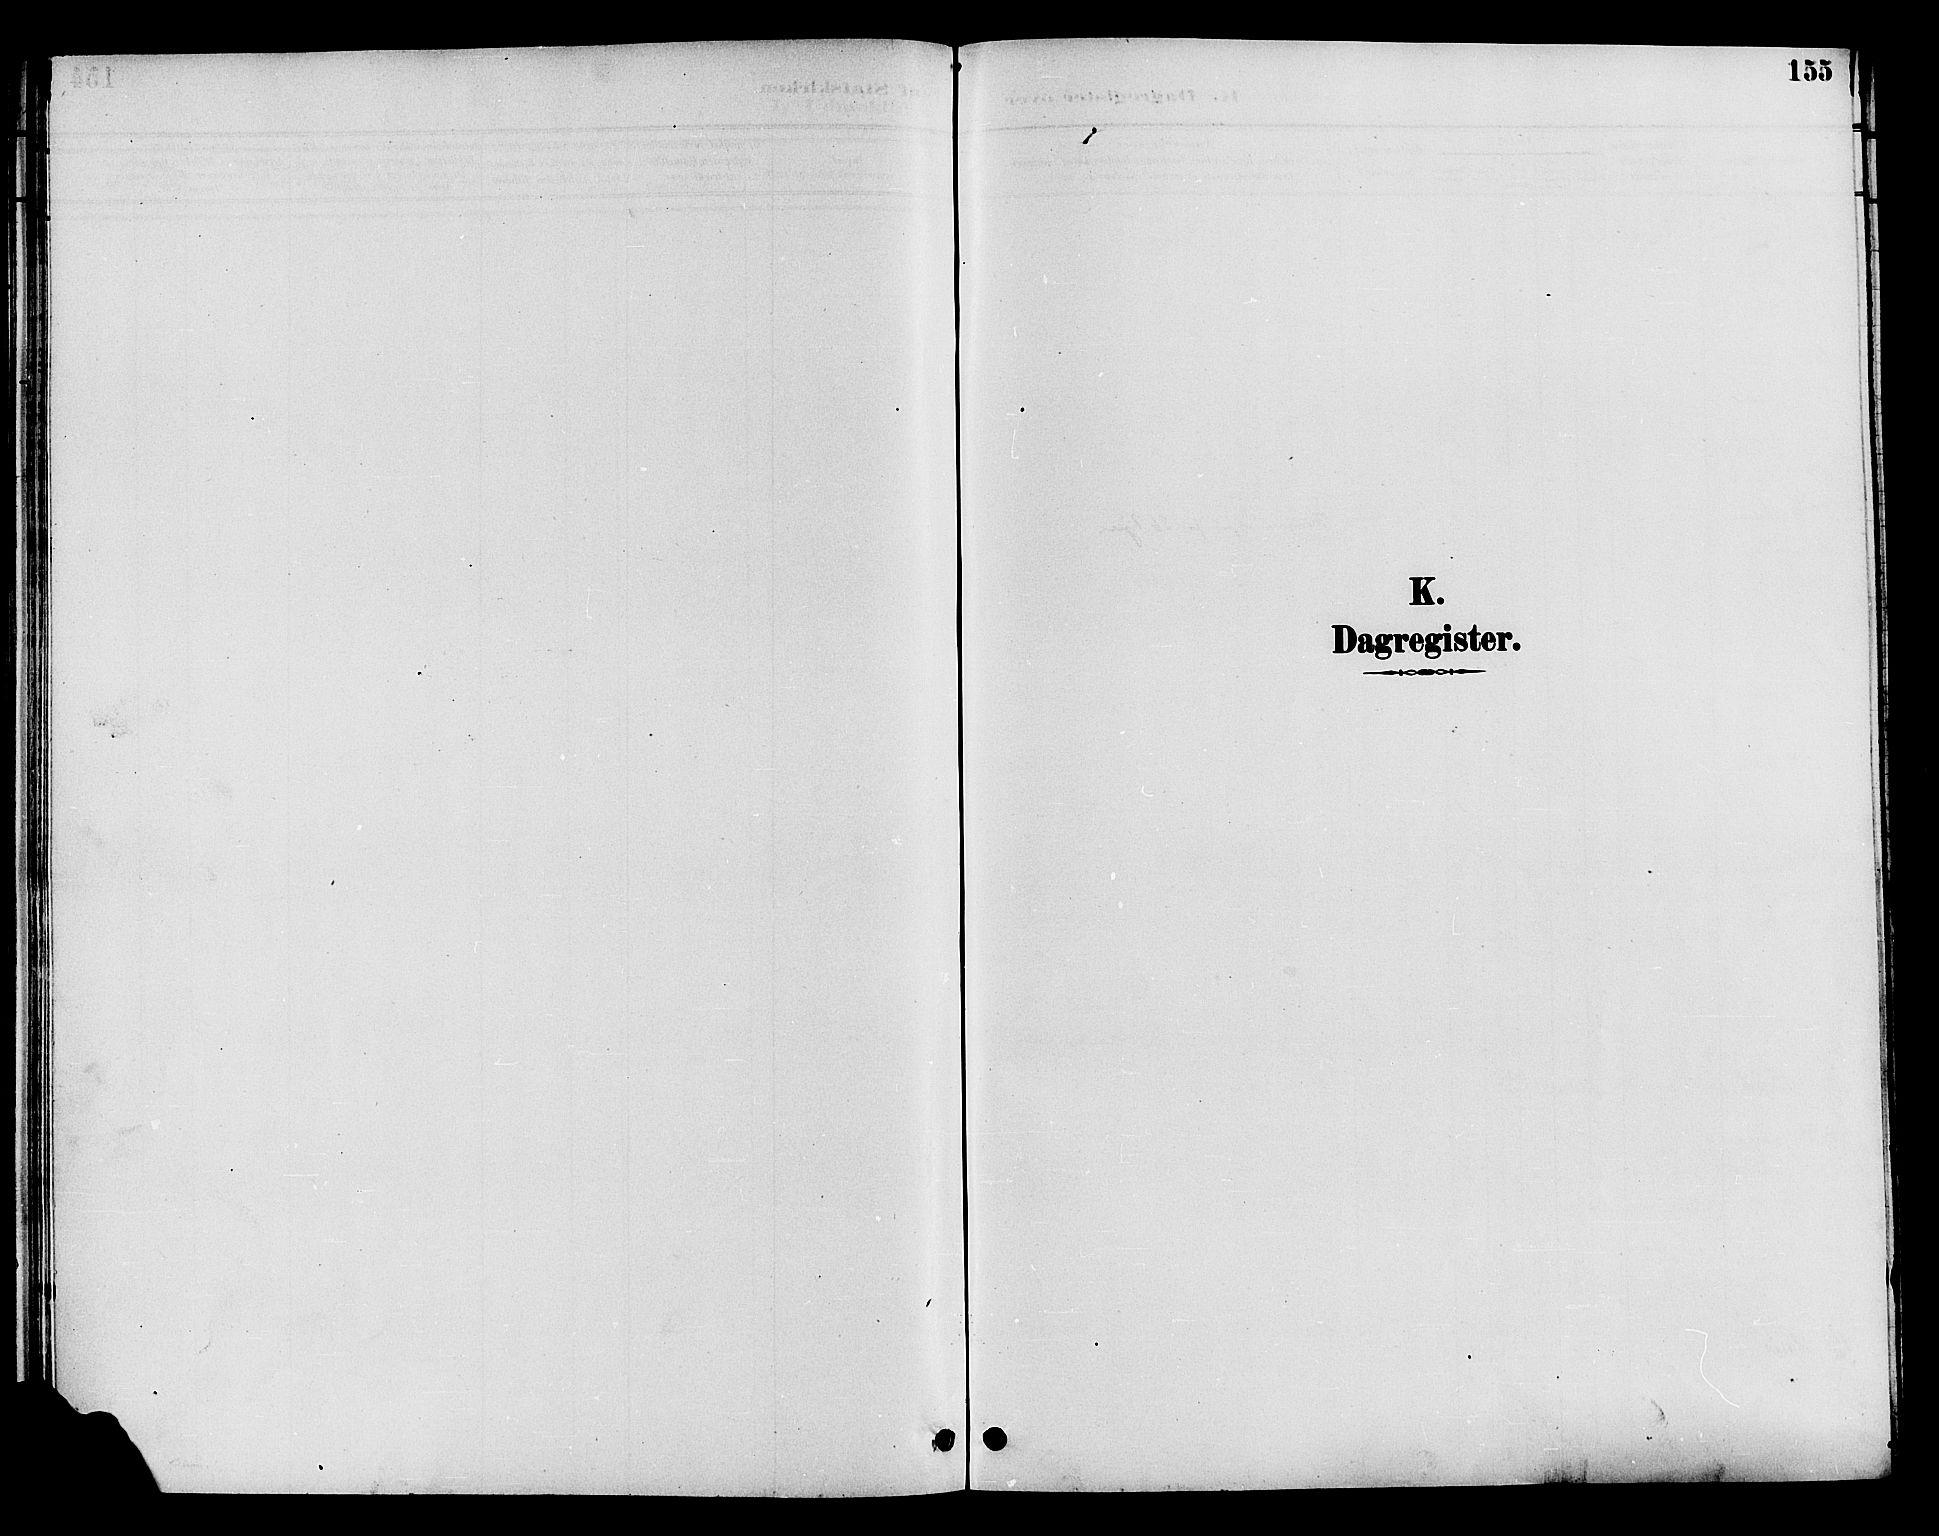 SAH, Øystre Slidre prestekontor, Klokkerbok nr. 4, 1887-1907, s. 155